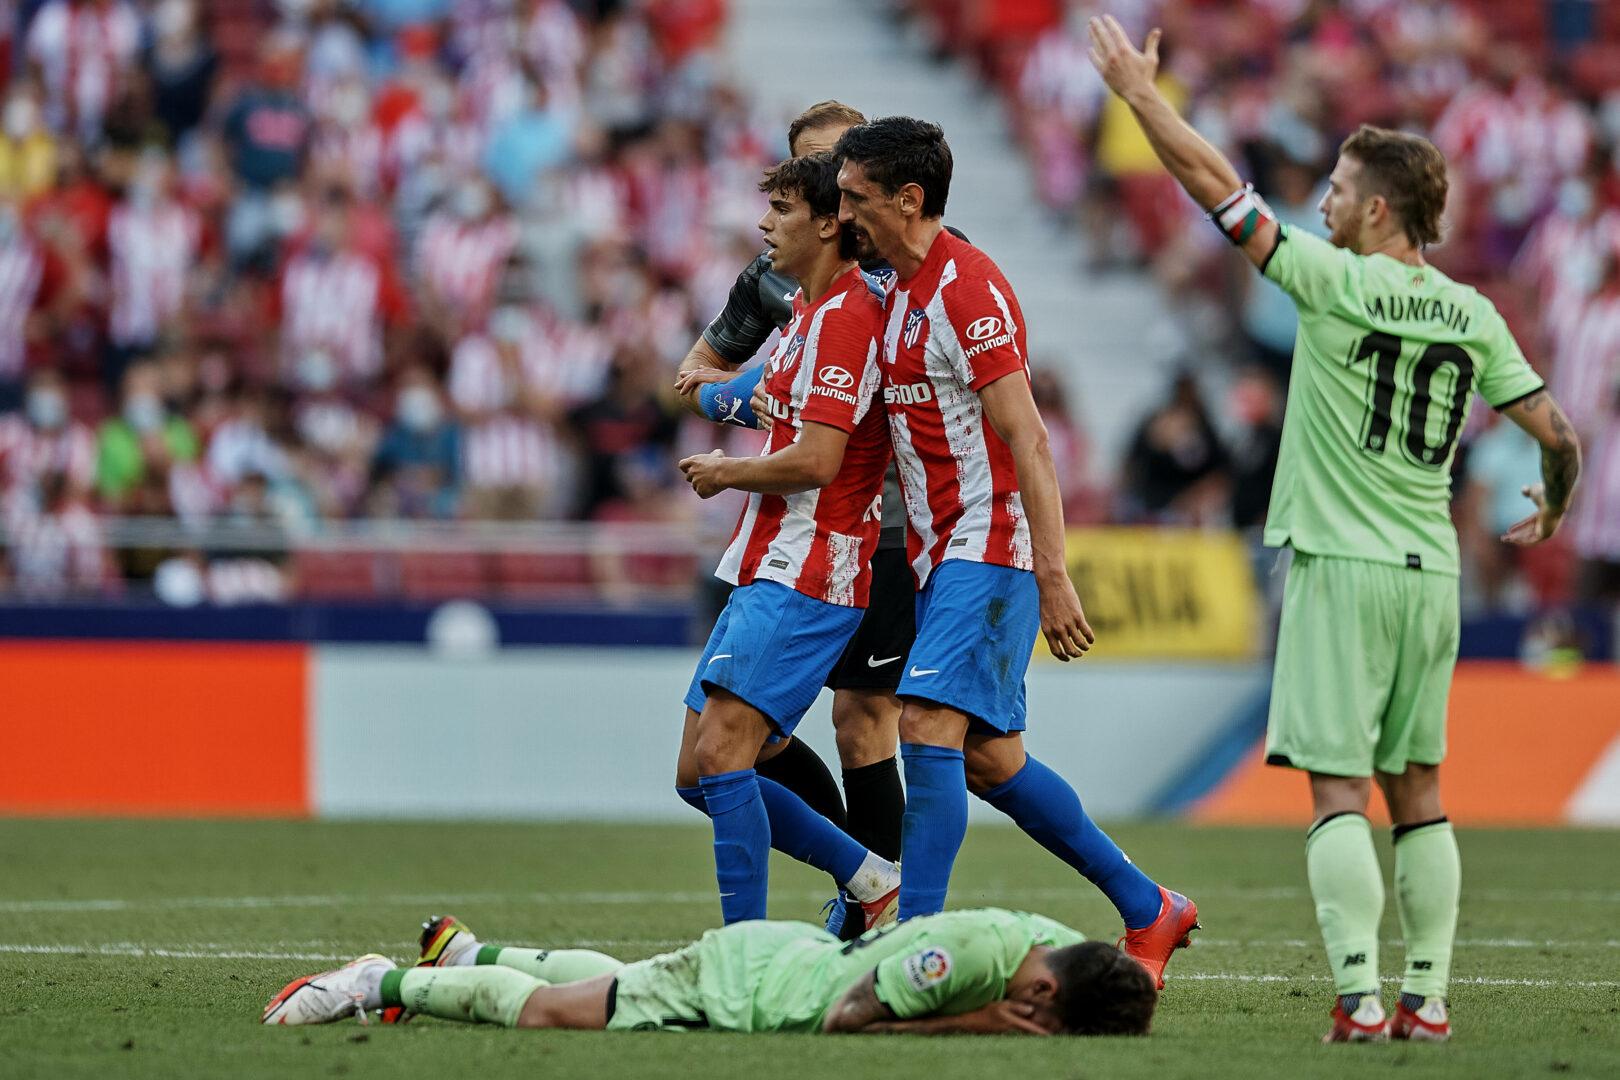 Atletico-Stürmer Joao Felix wird mit Rot vom Platz geschickt